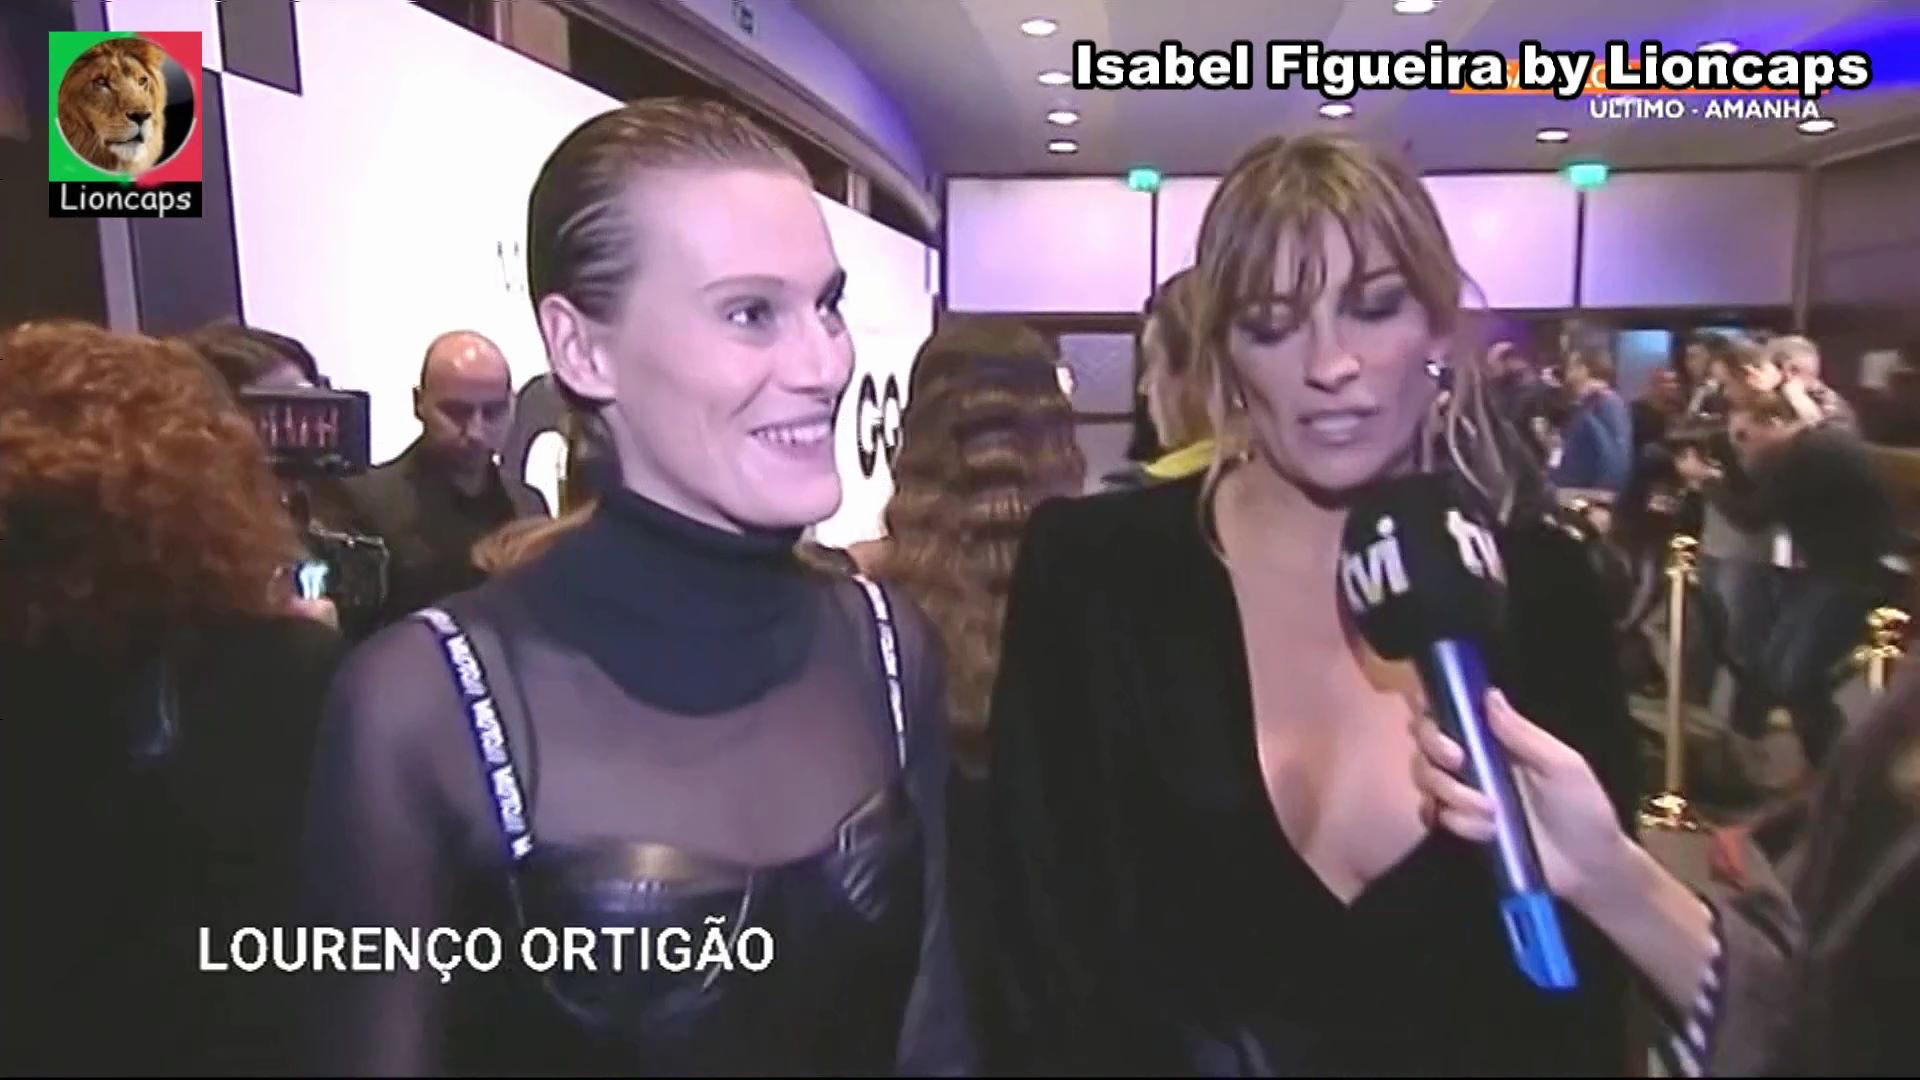 033846346_isabel_figueira_vs190612_1291_122_146lo.JPG